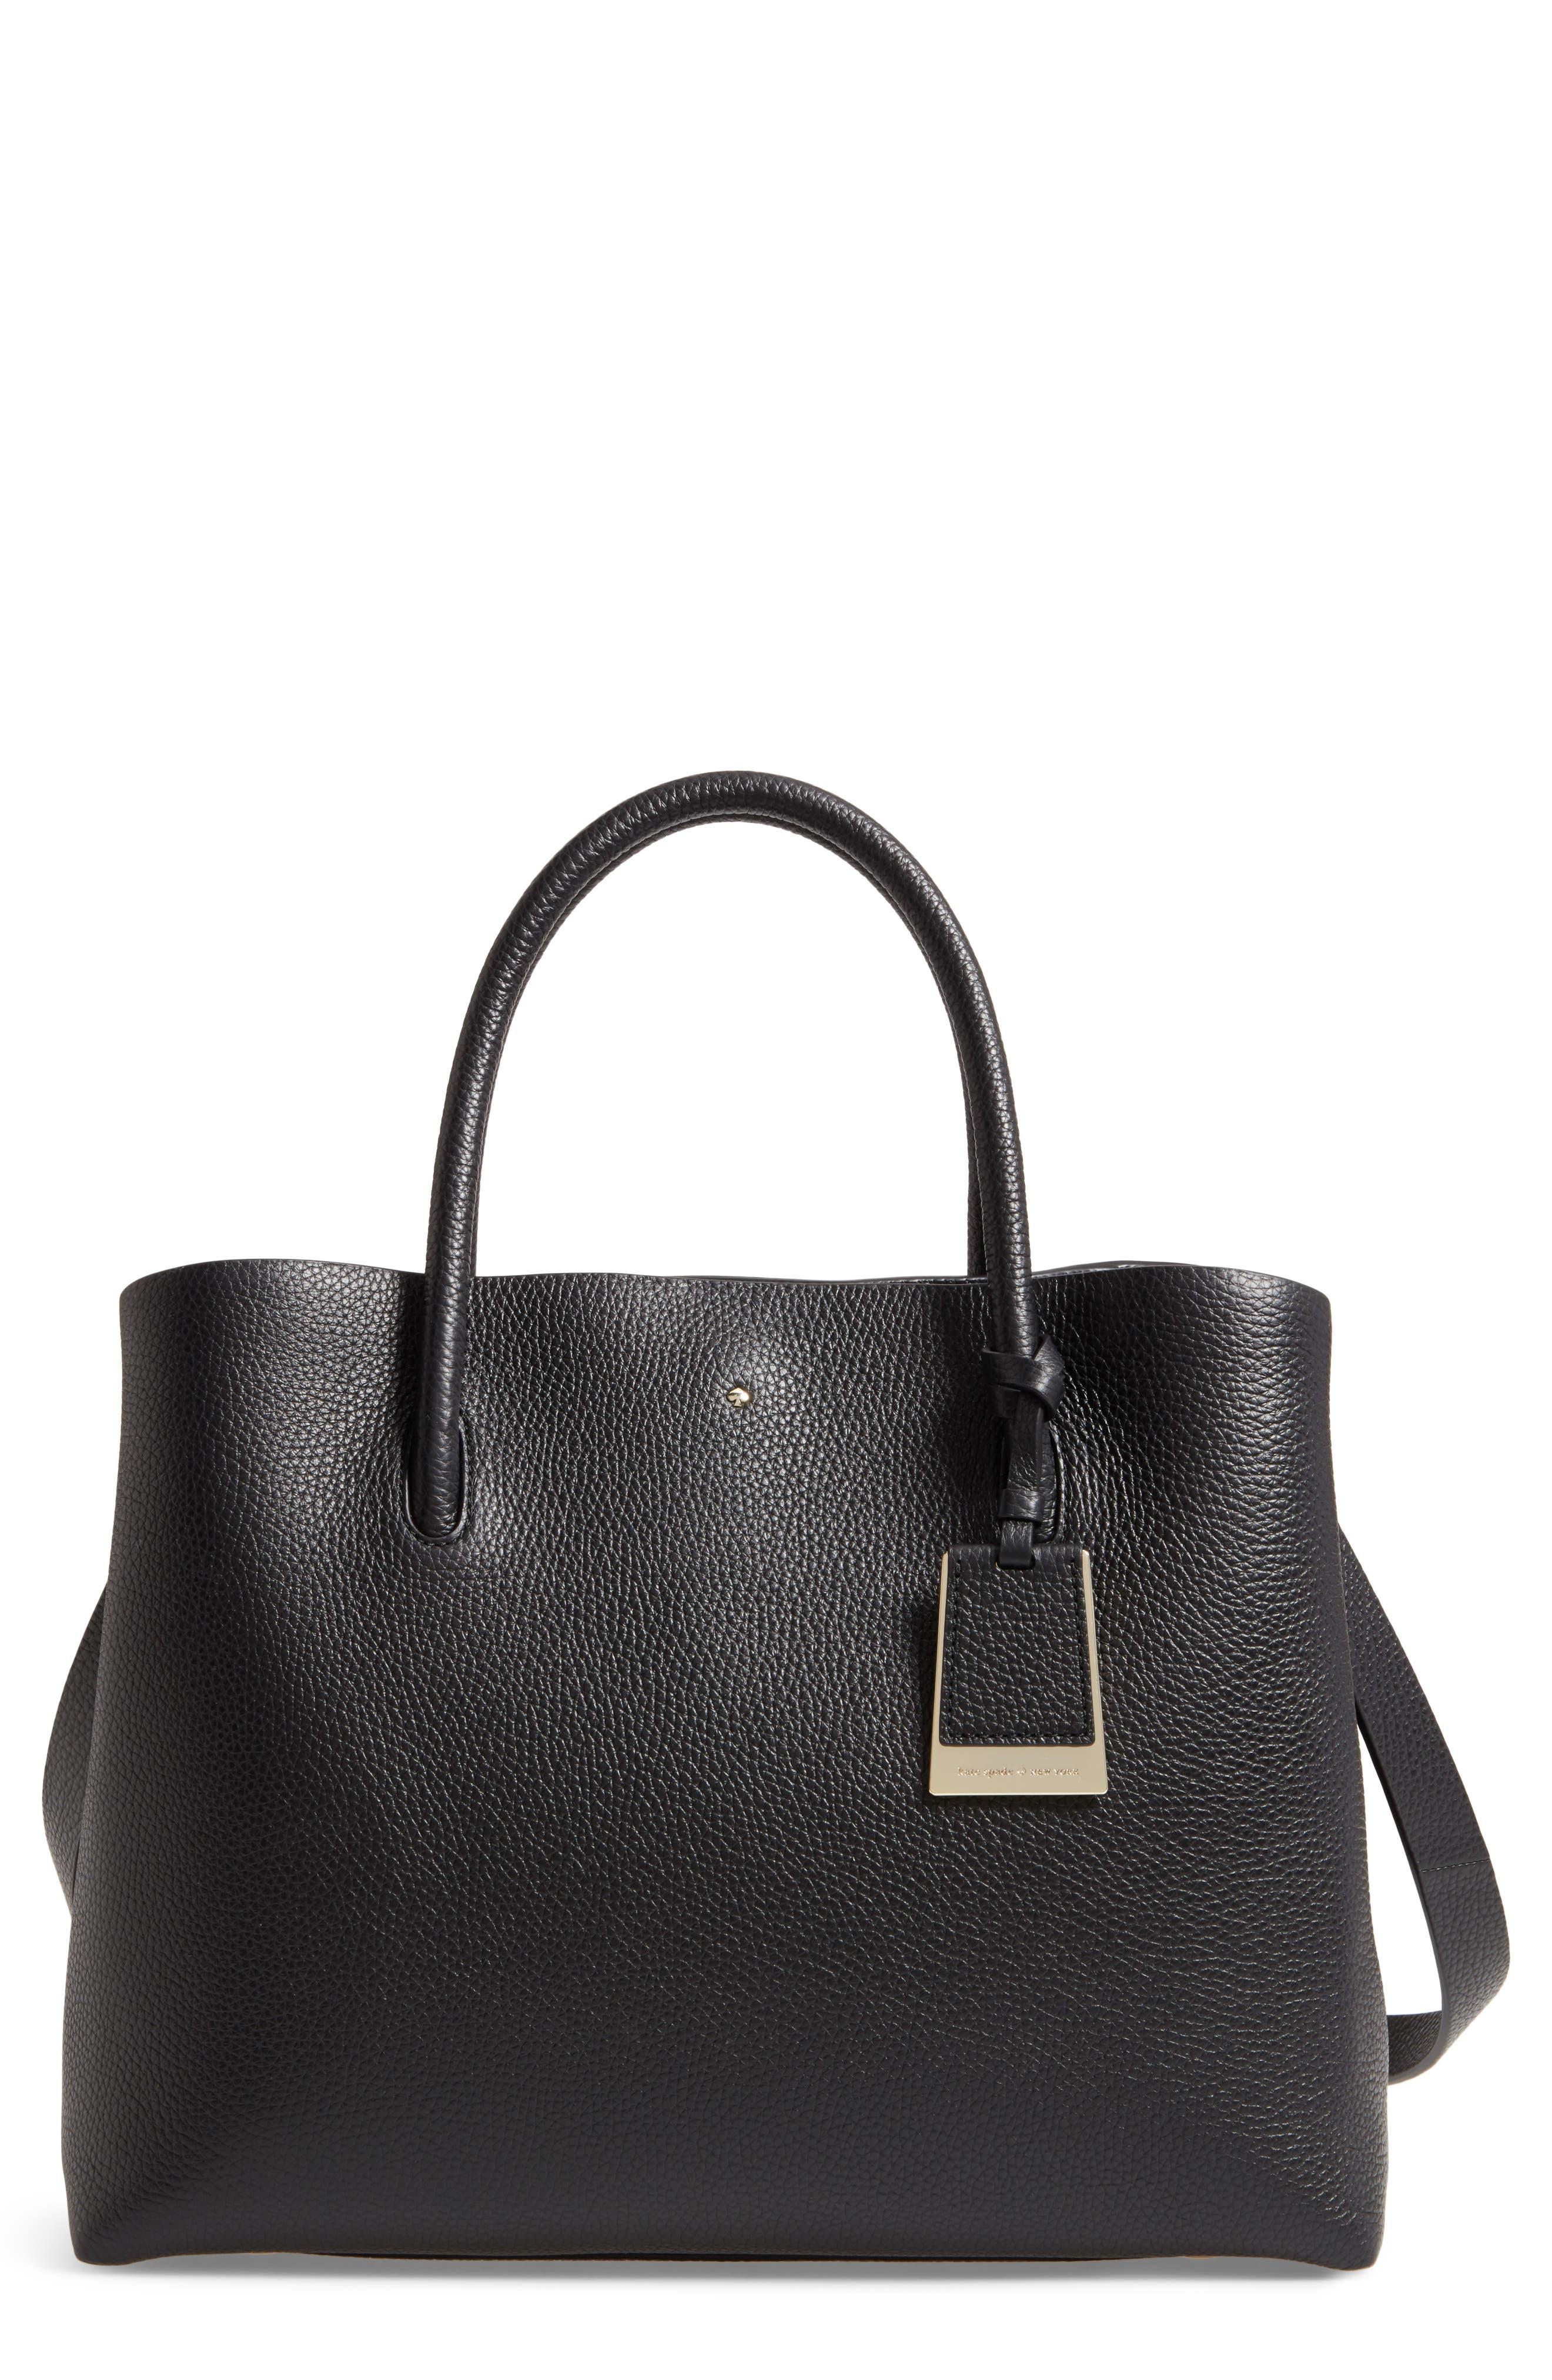 KATE SPADE NEW YORK large madison knollwood drive - celestina leather satchel